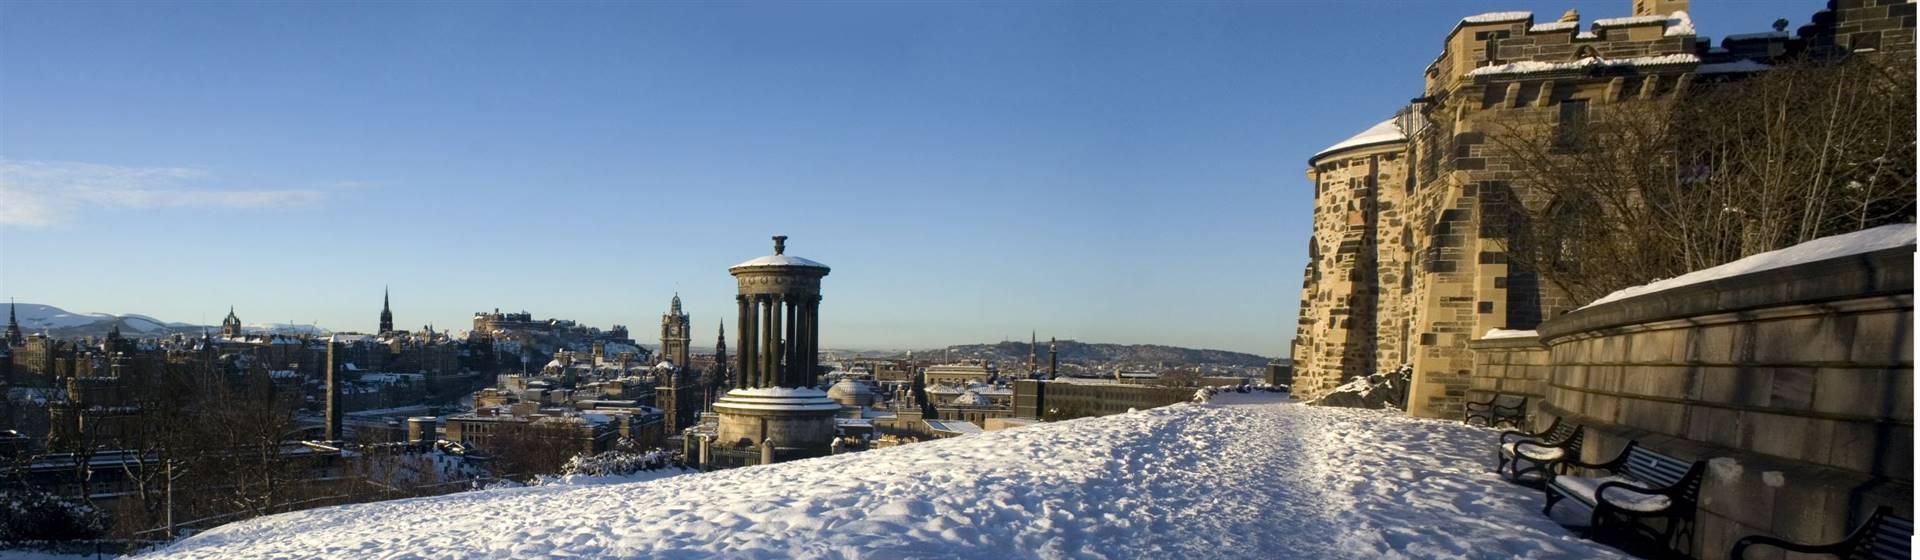 "<img src=""edinburghinsnow-shutterstock.jpeg"" alt=""Edinburgh in the Snow""/>"